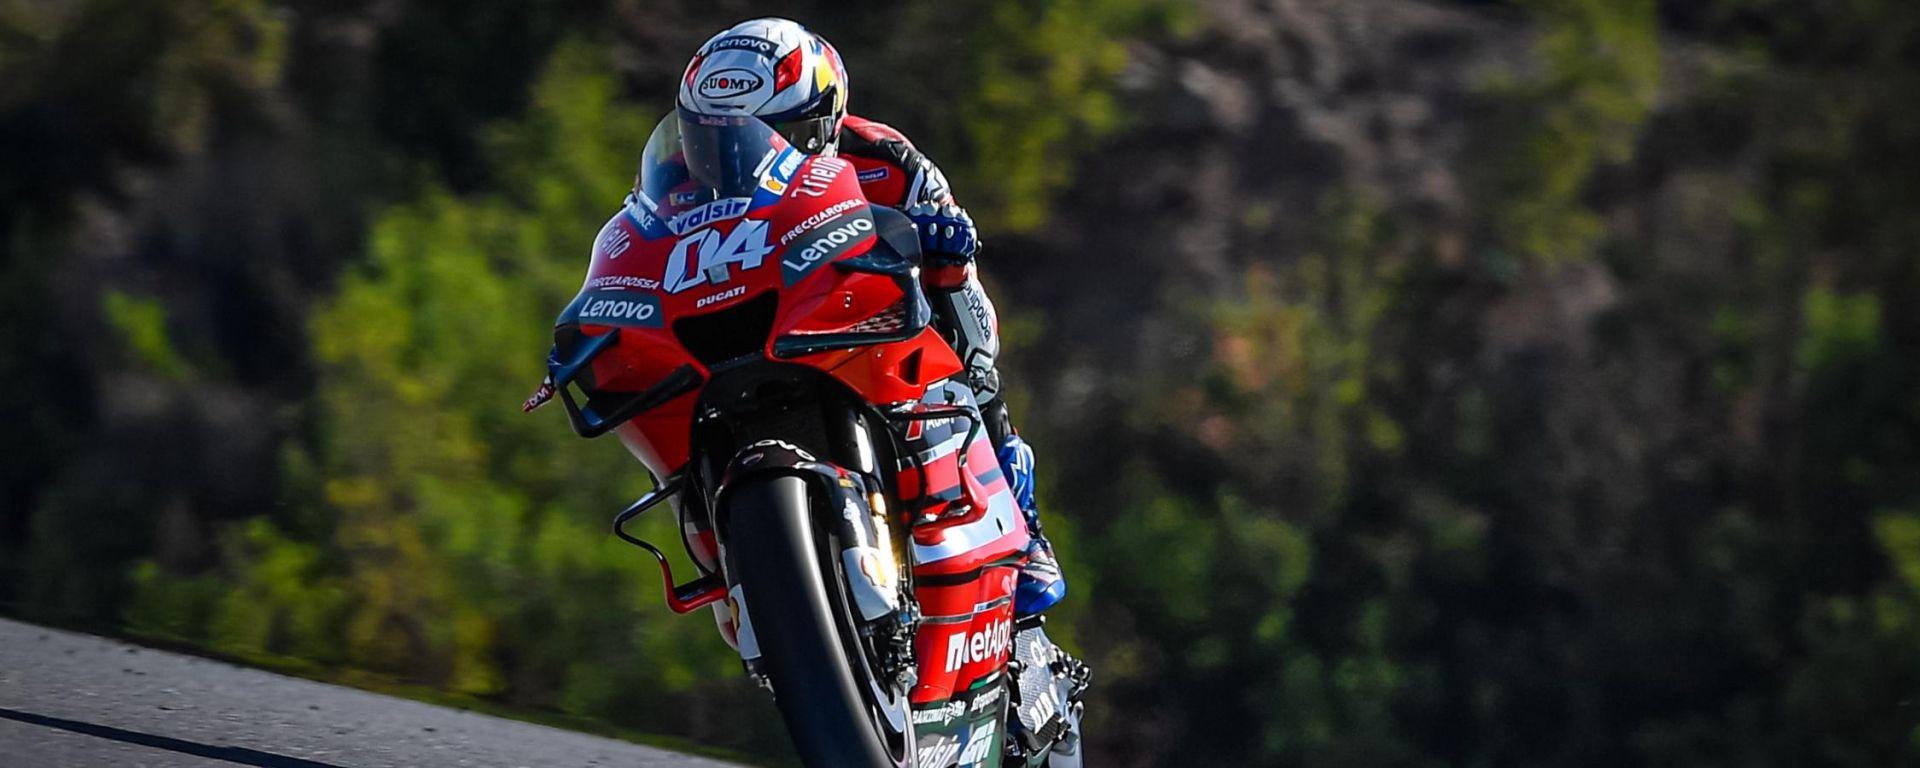 Test MotoGP Jerez 2020: Andrea Dovizioso (Ducati)